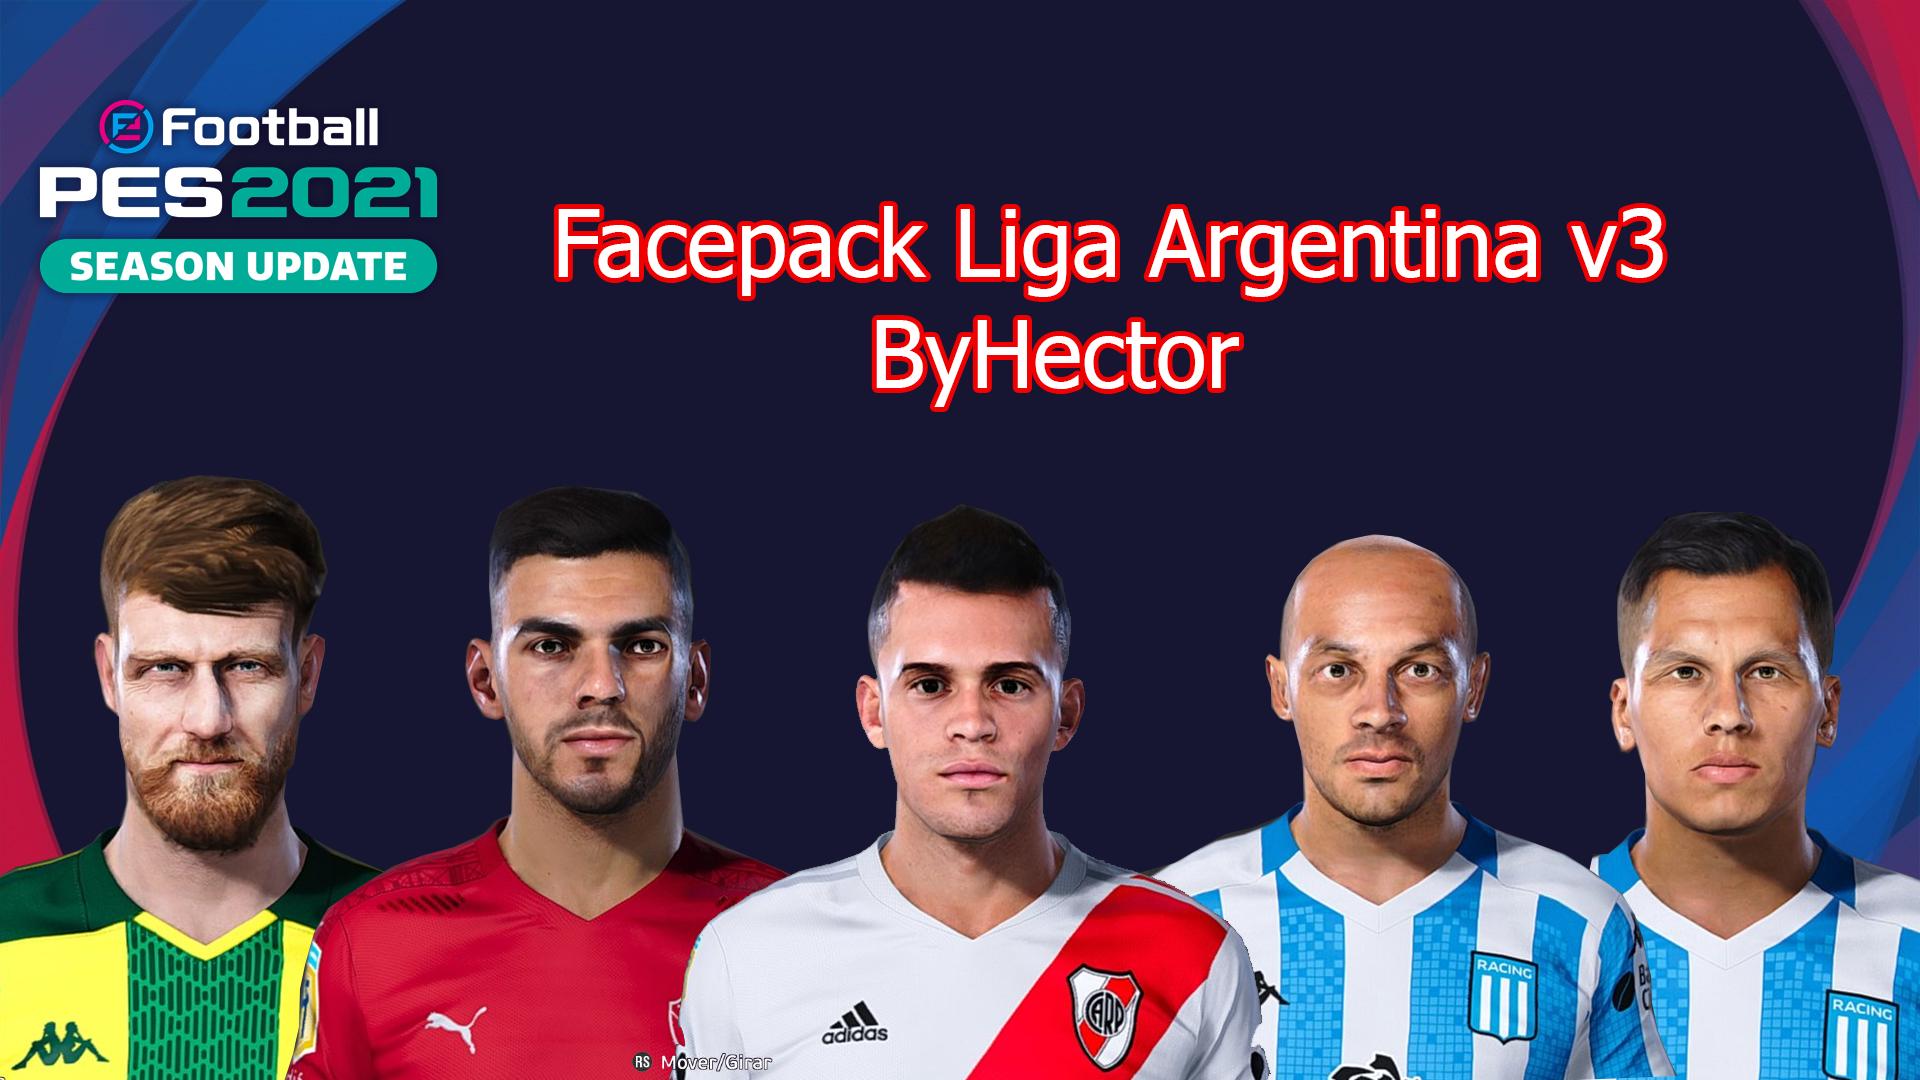 Facepack Liga Argentina v3 by Hectorr